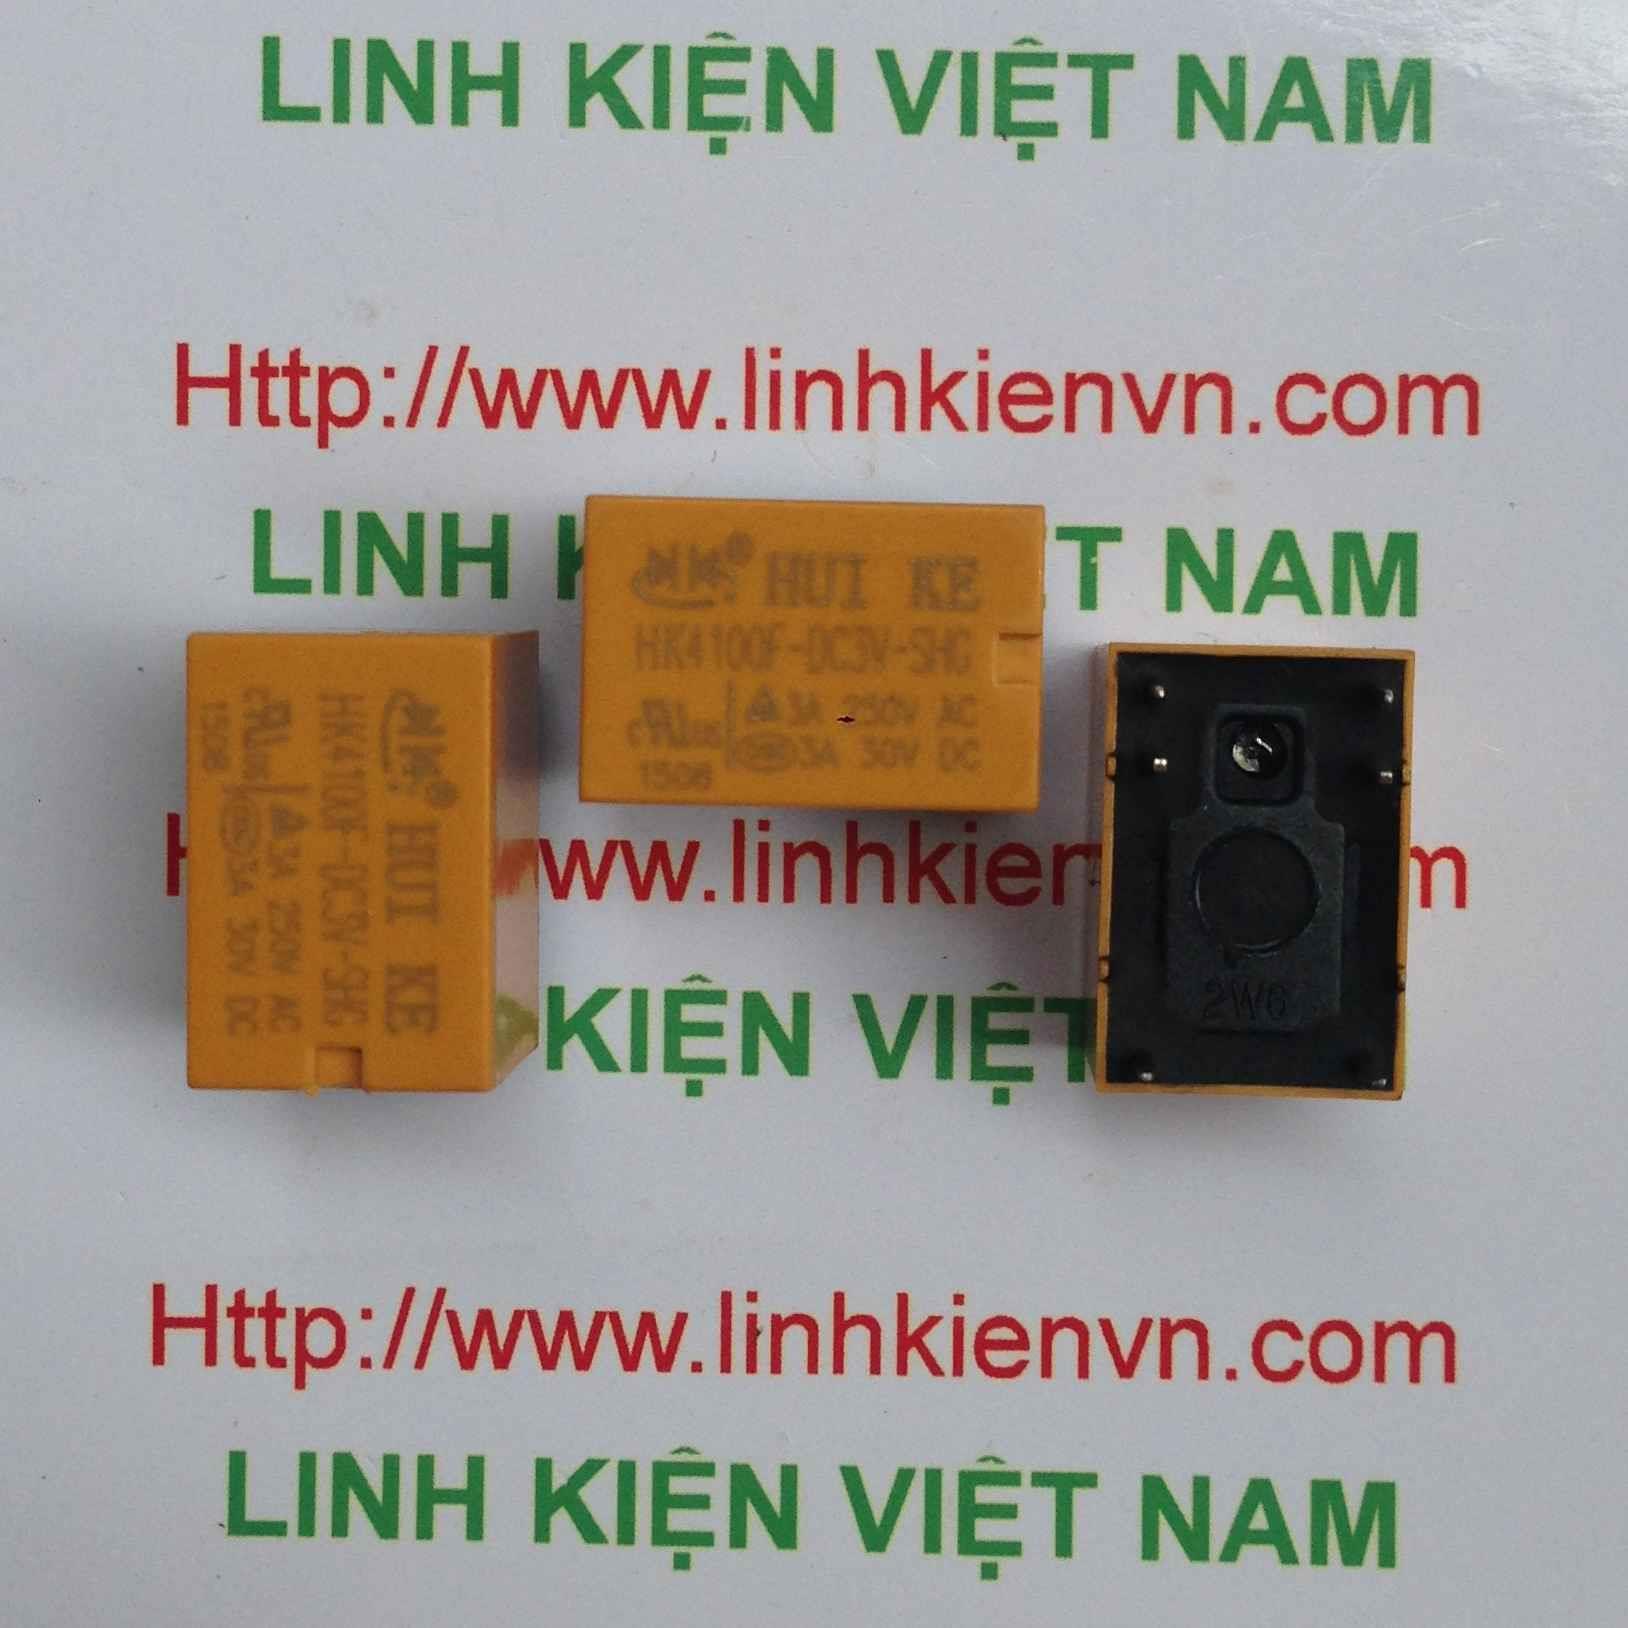 Relay Huike 1 cặp tiếp điểm 3V-3A | HK4100F-DC 3V-SHG - A2H20(KB4H3)